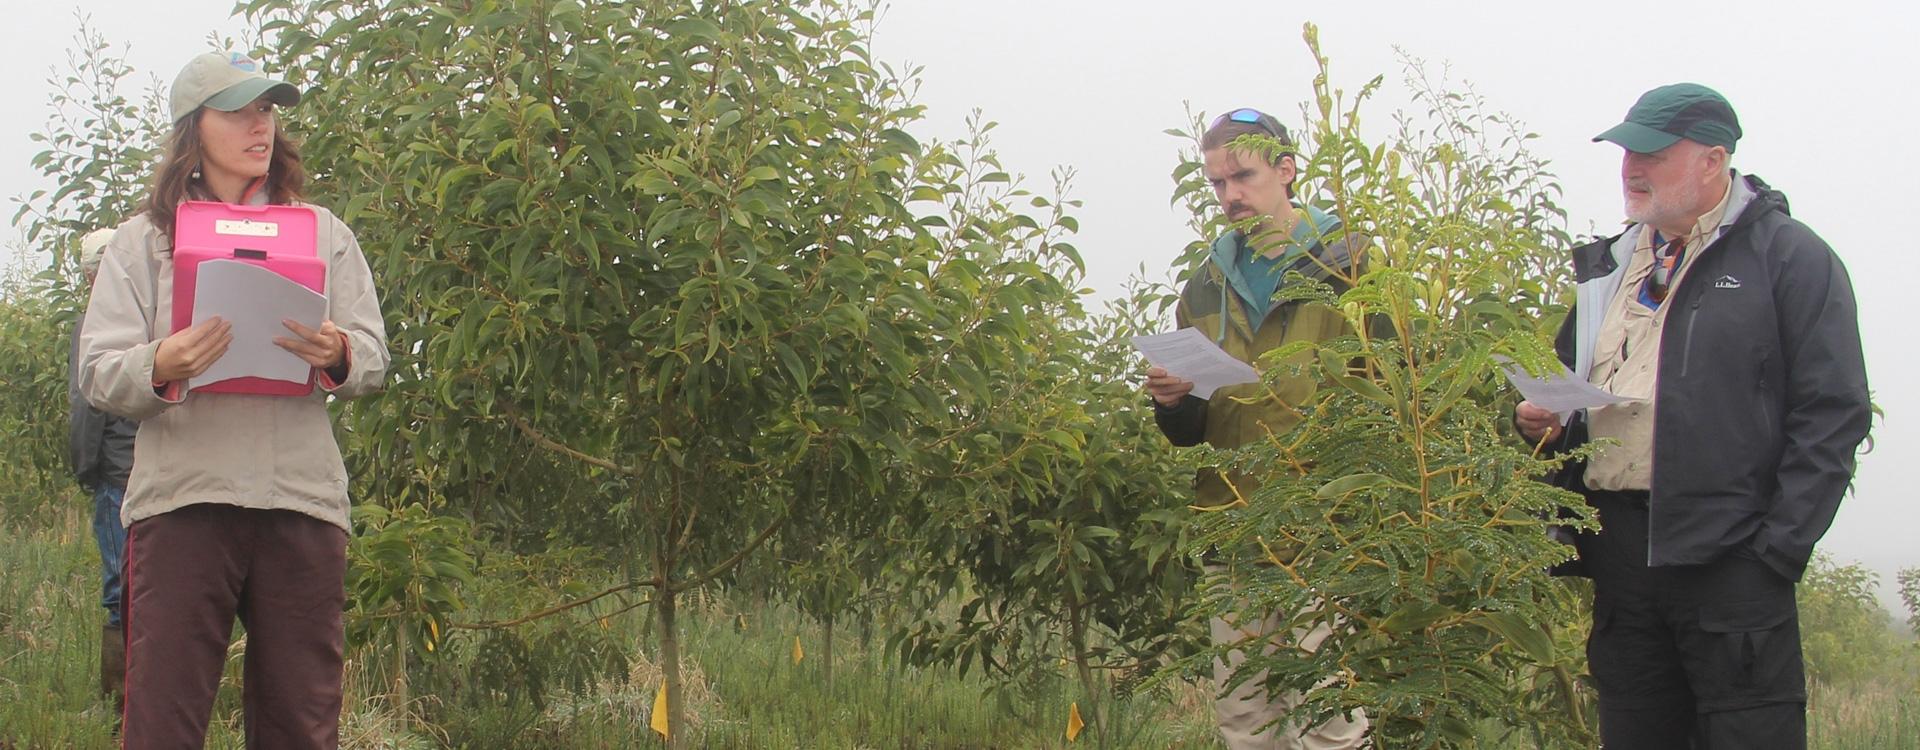 Koa seed orchard